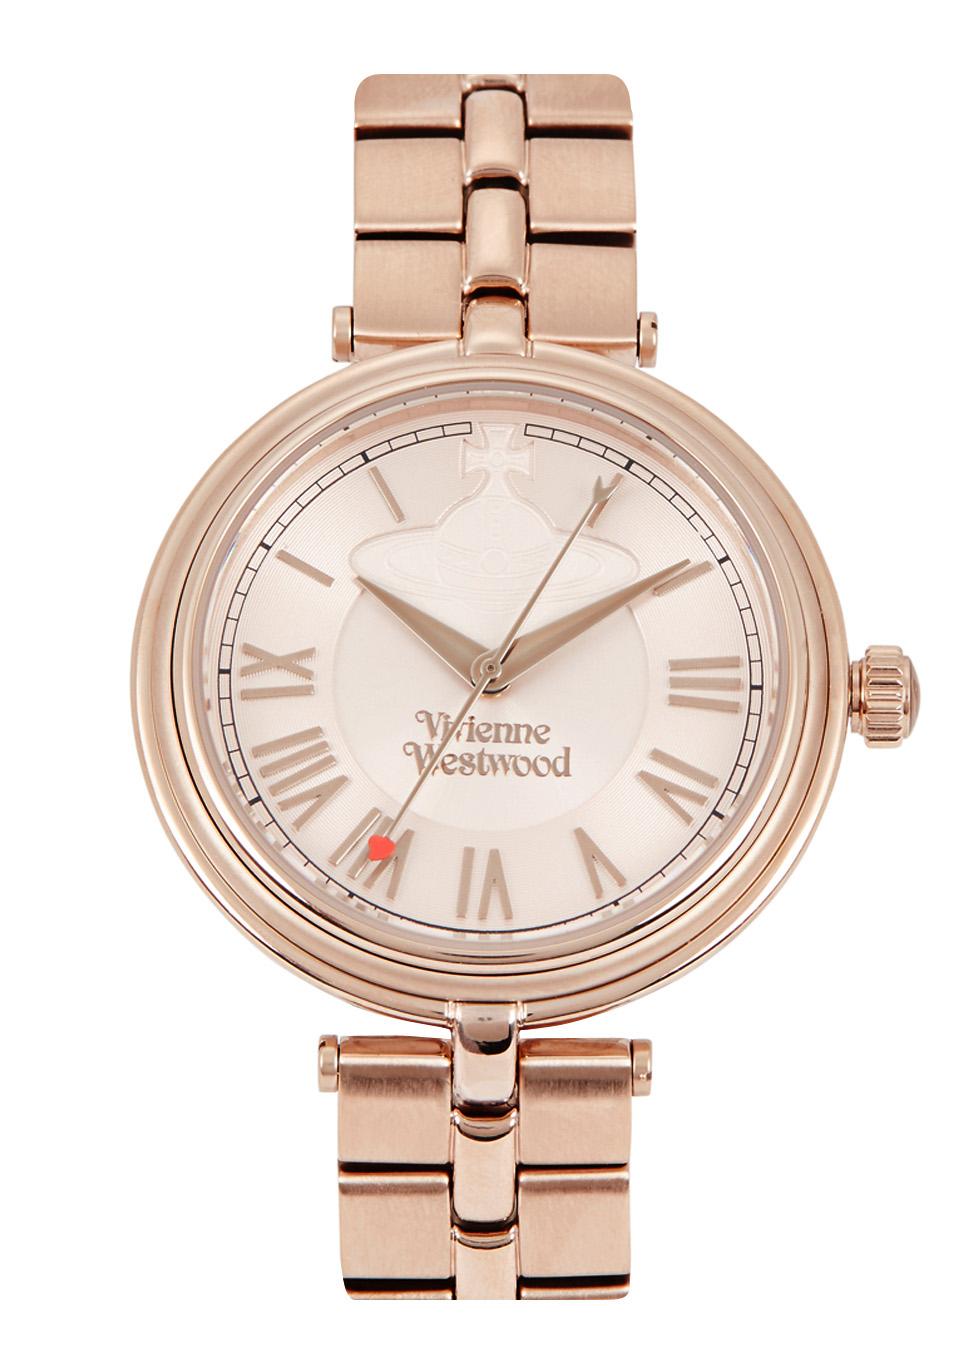 Farringdon rose gold tone watch - Vivienne Westwood